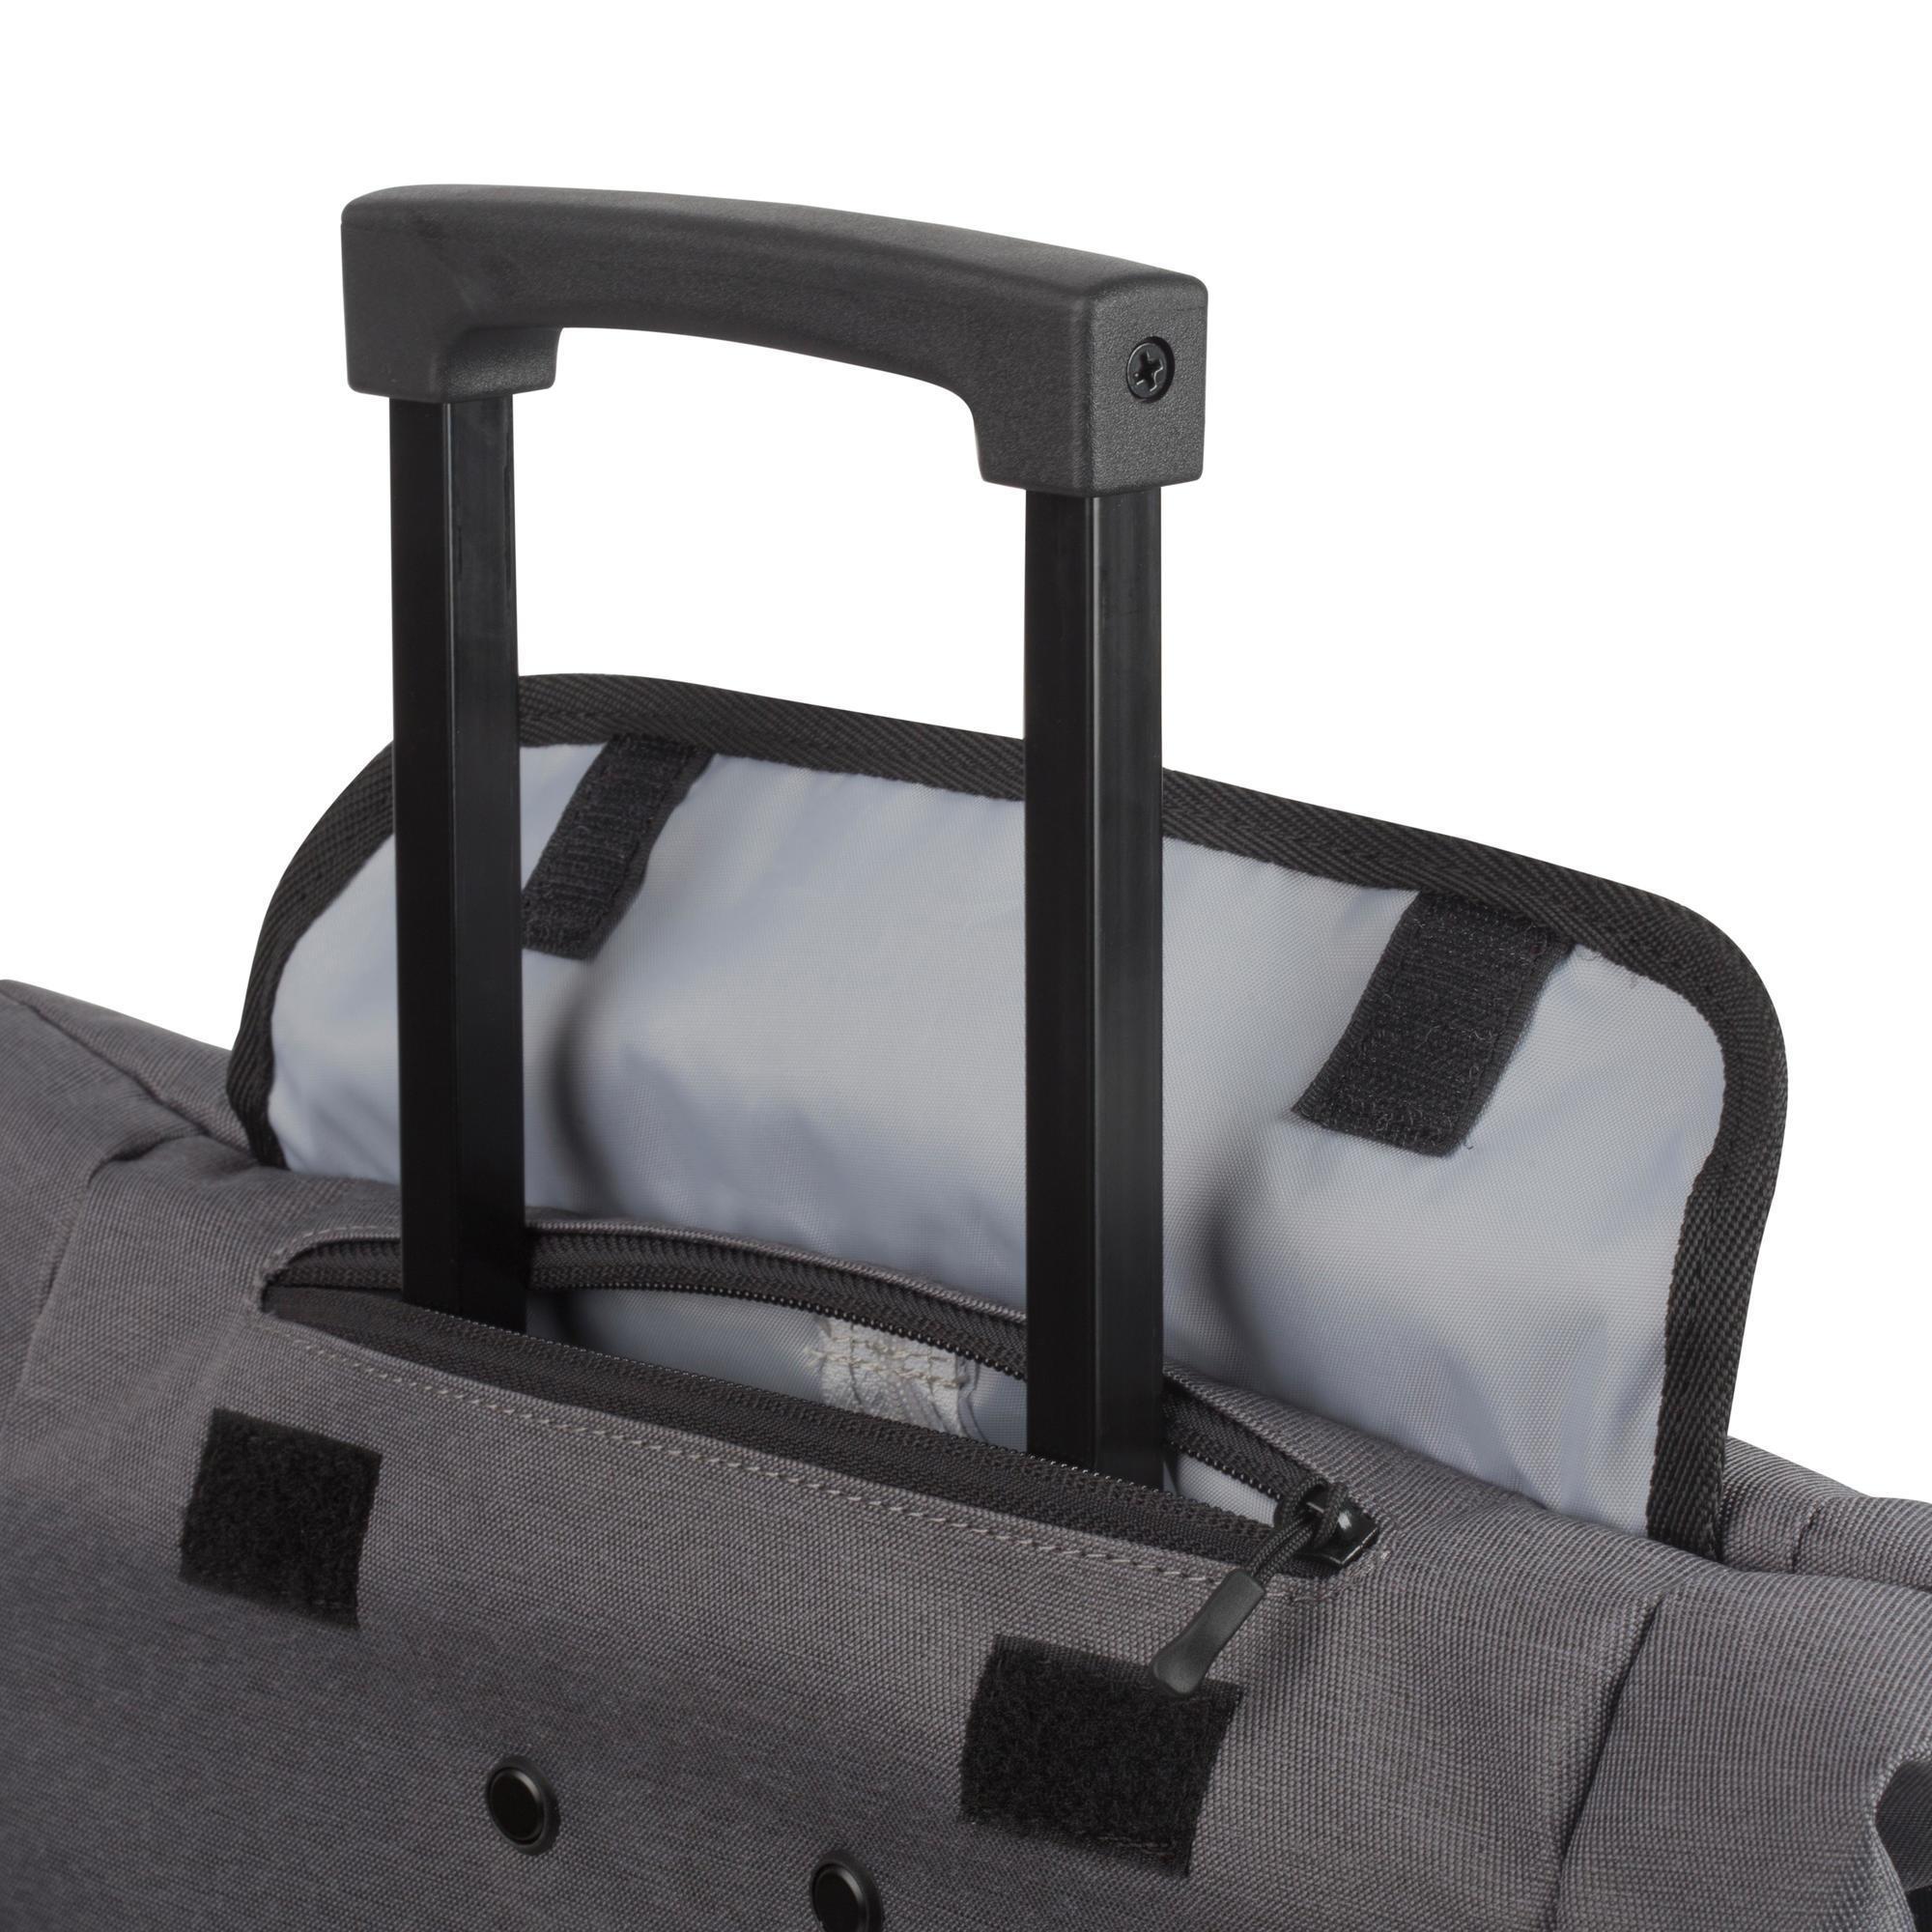 B'twin Trolley 900 kopen? Leest dit eerst: Fietsaccessoires Fietsmanden en fietstassen/Fietstassen met korting